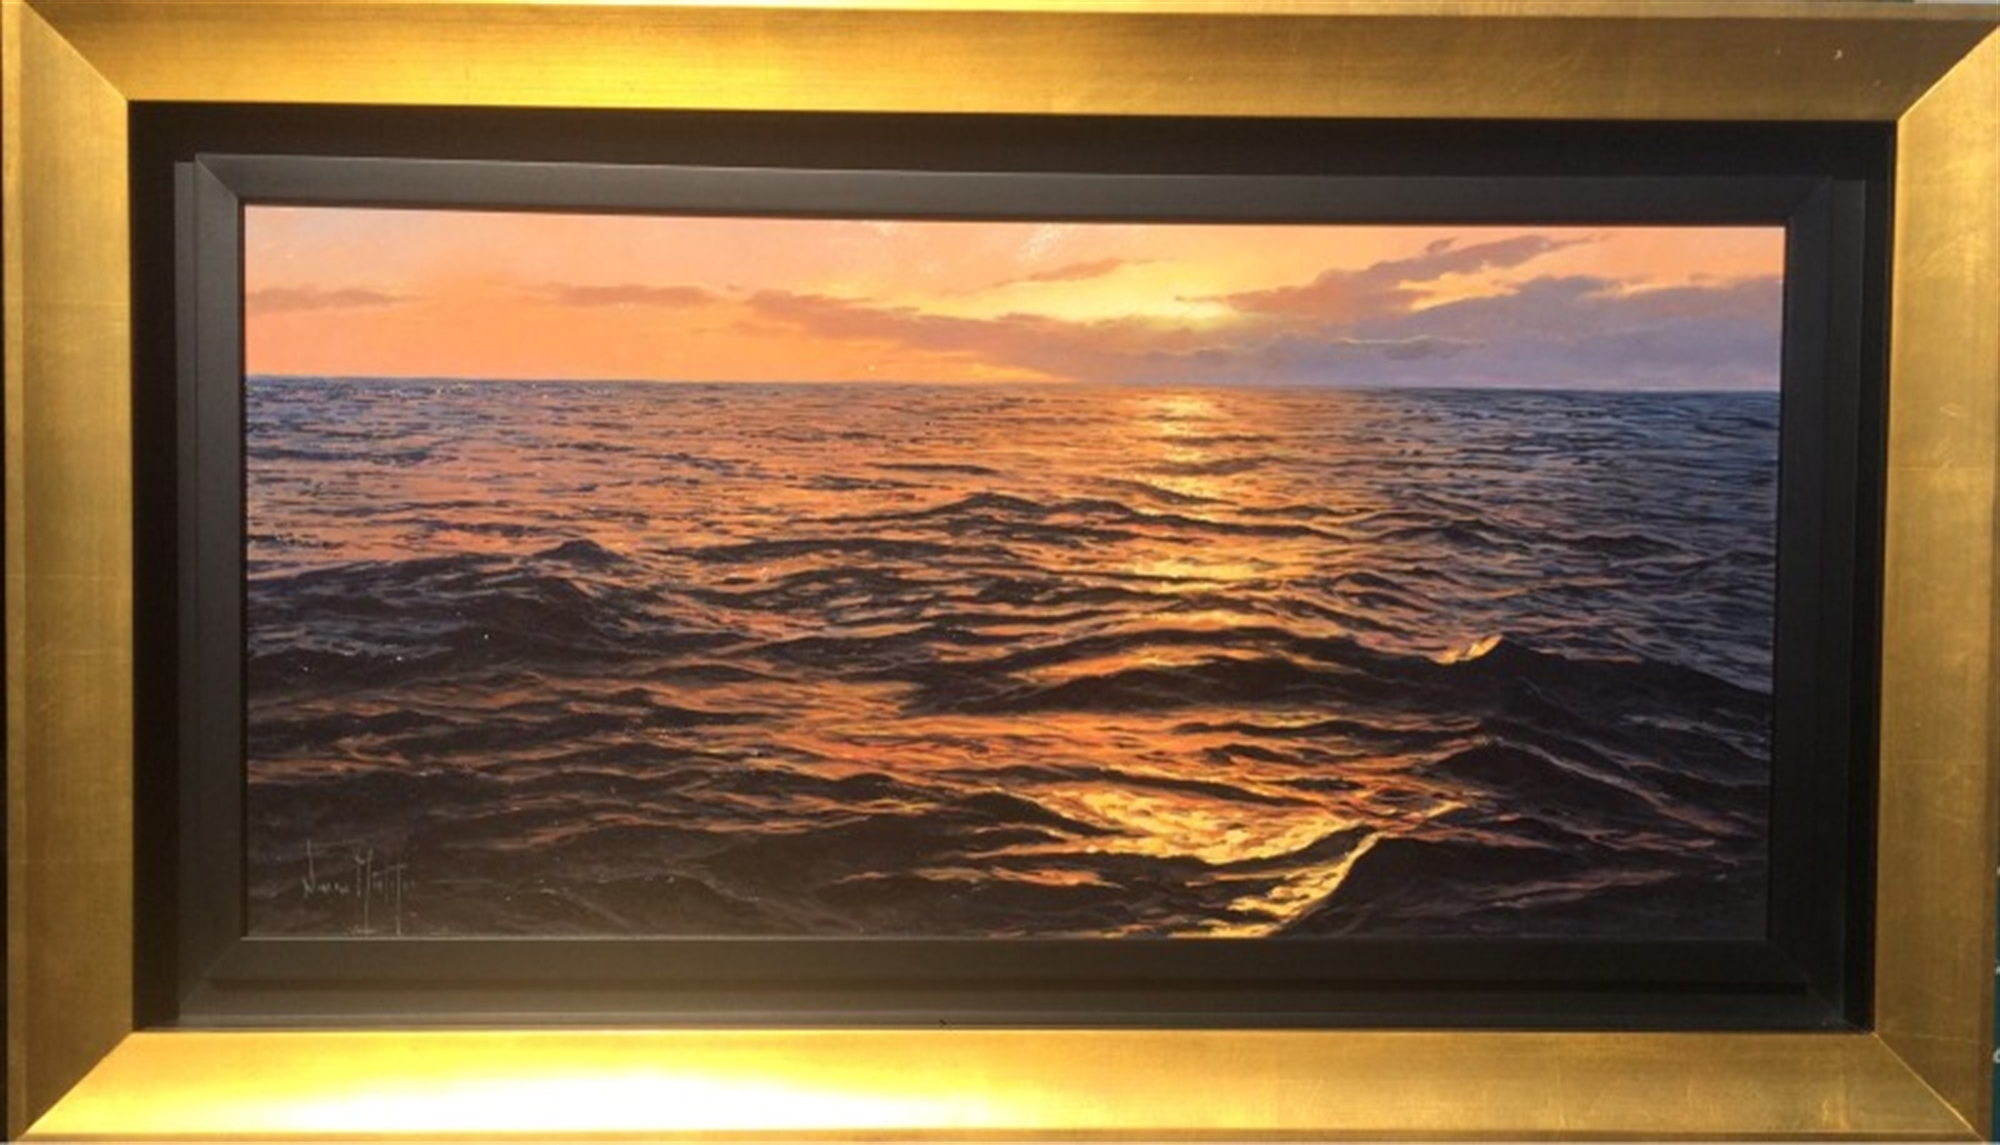 The Golden Hour by Alfredo Navarro